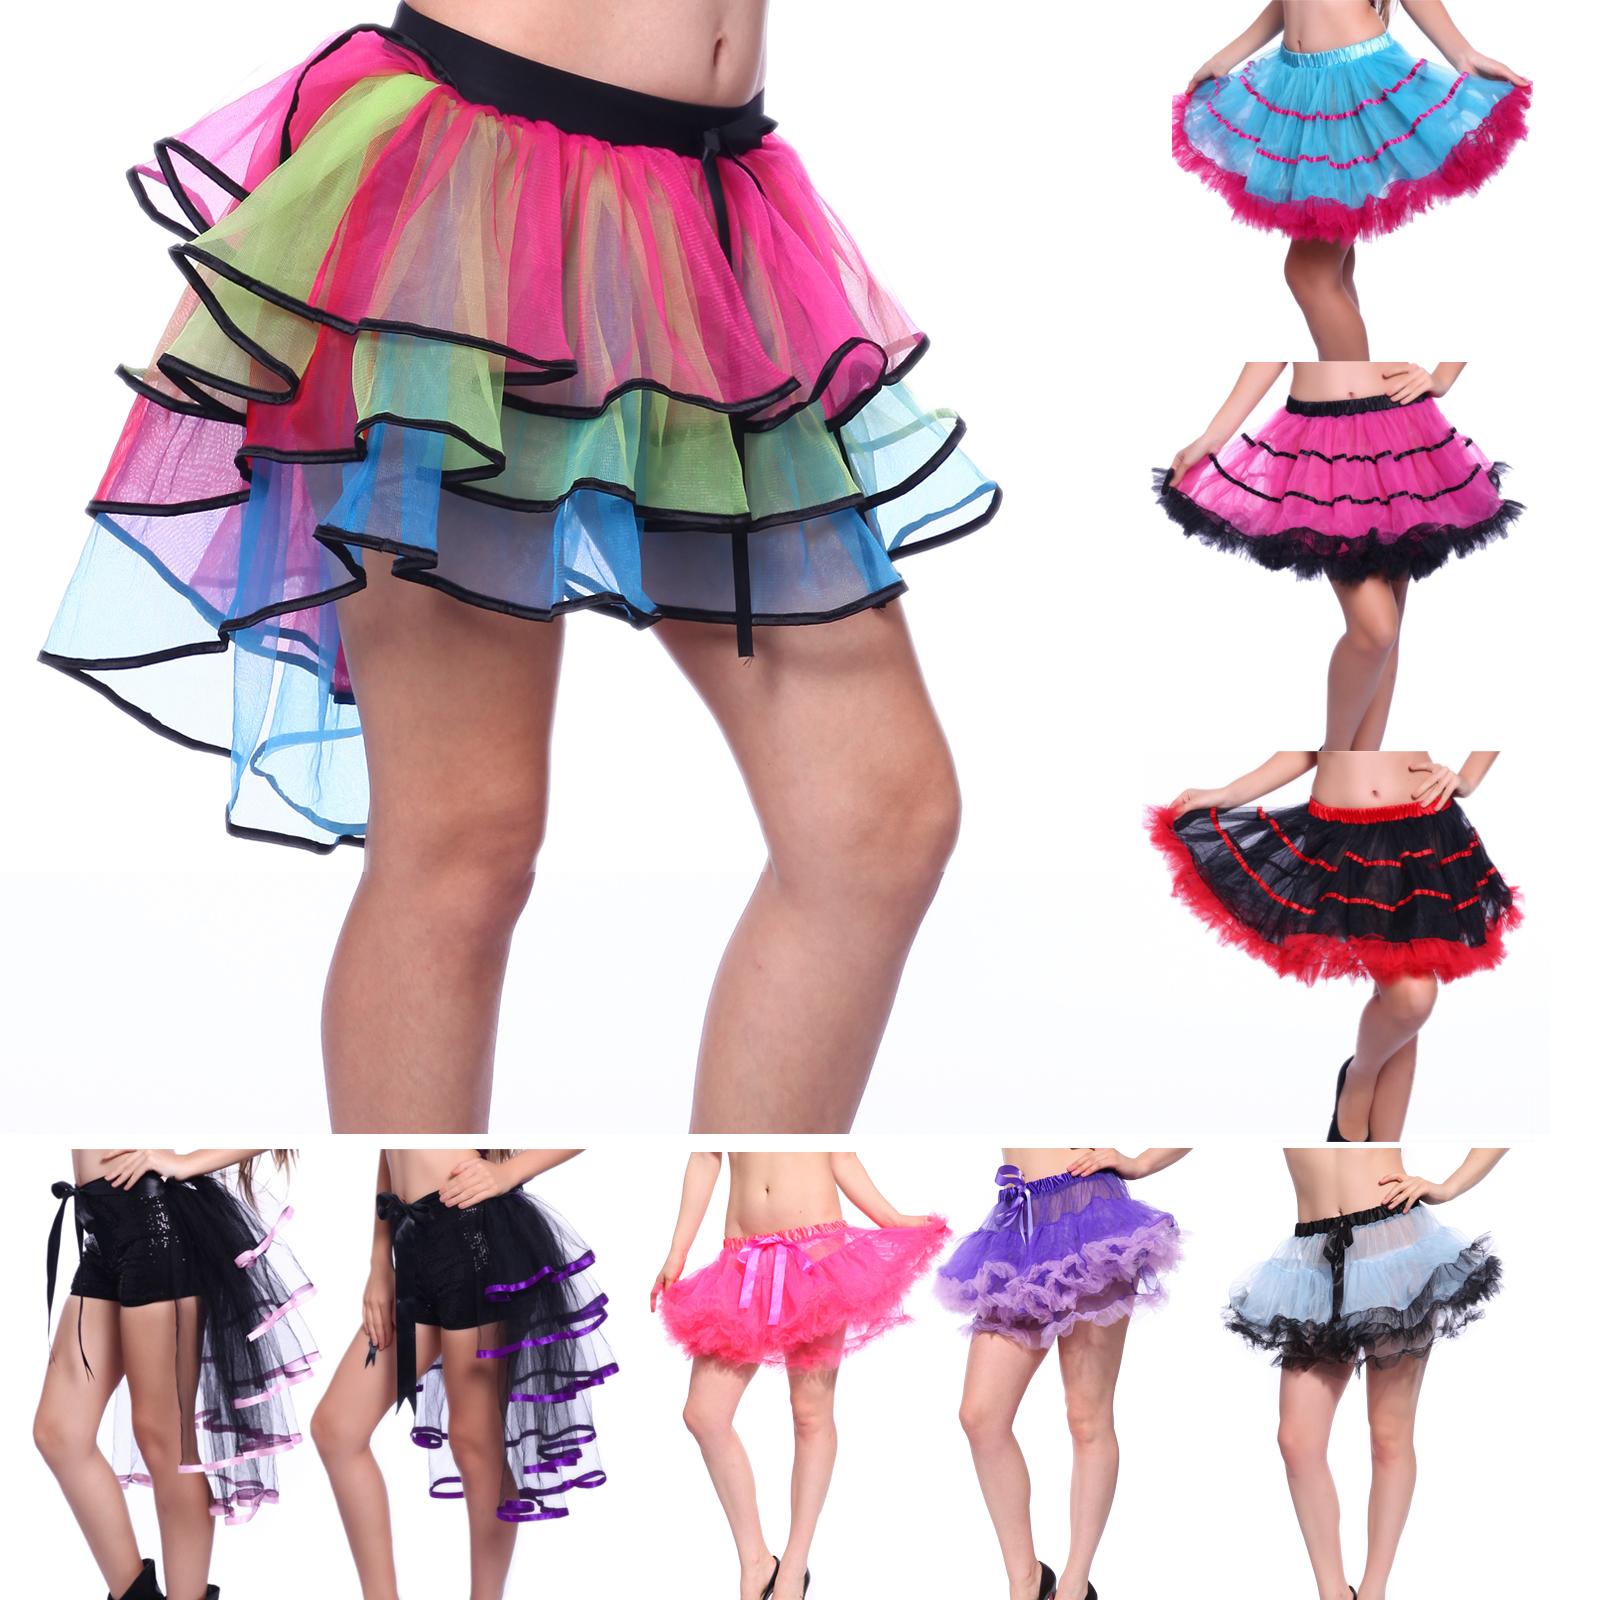 11a4421a816 Rainbow Neon RaRa Rave Party Ballet Dance Ruffle Tiered Tutu Skirt Clubwear